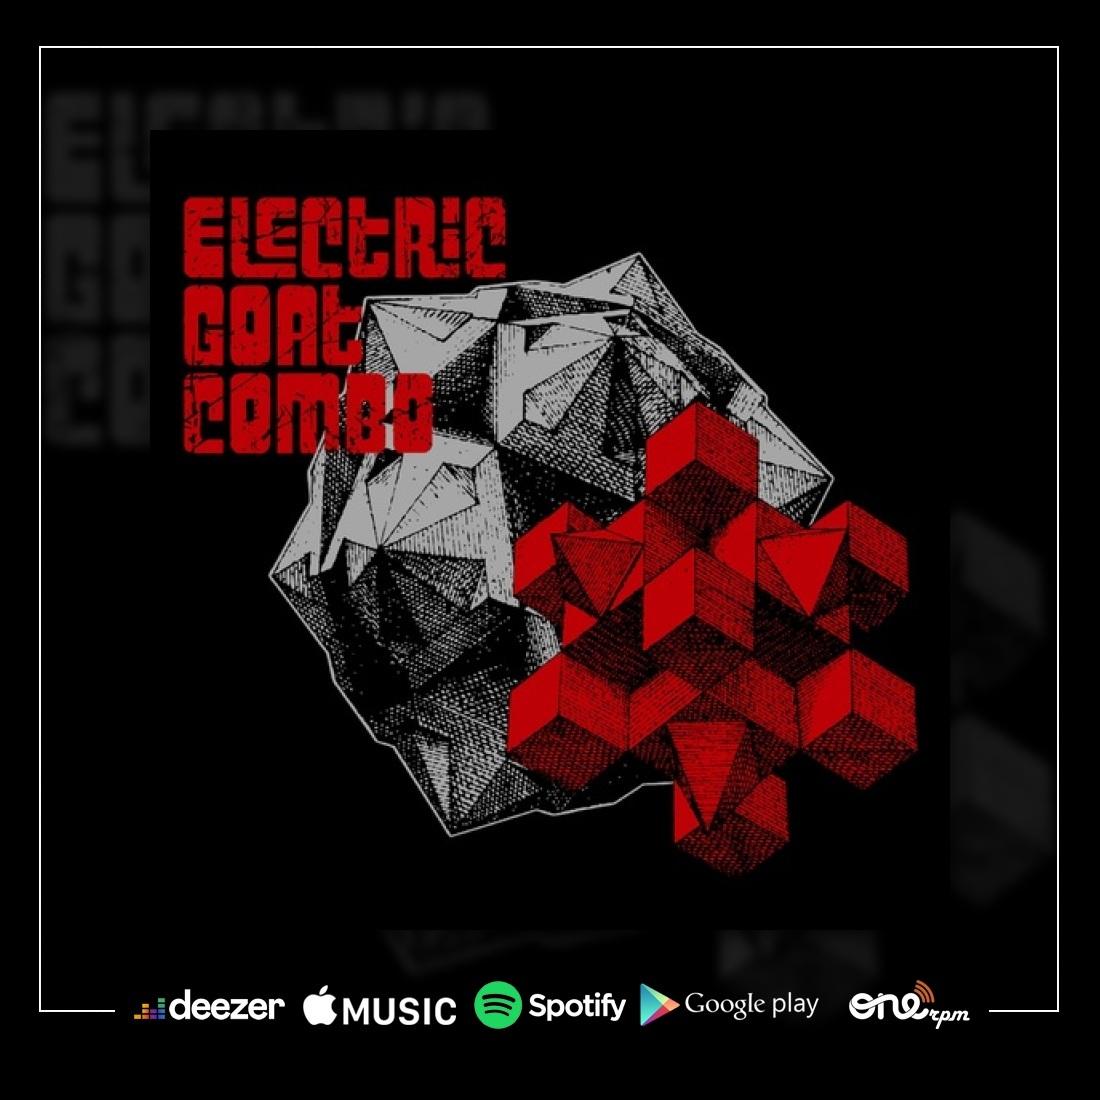 electricgoat